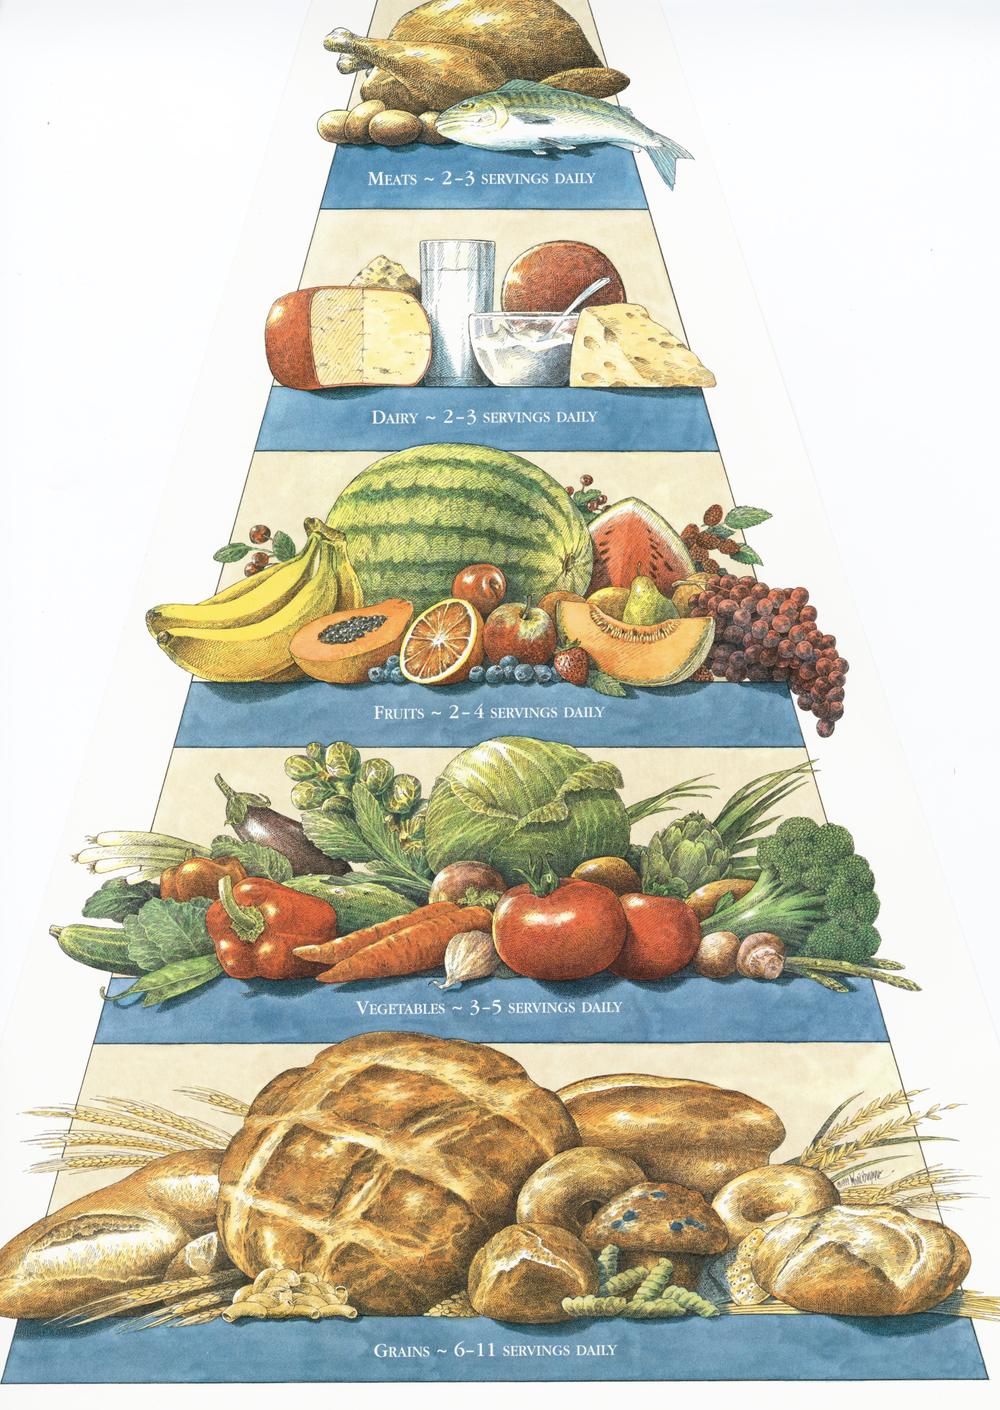 Food Pyramid031.jpg